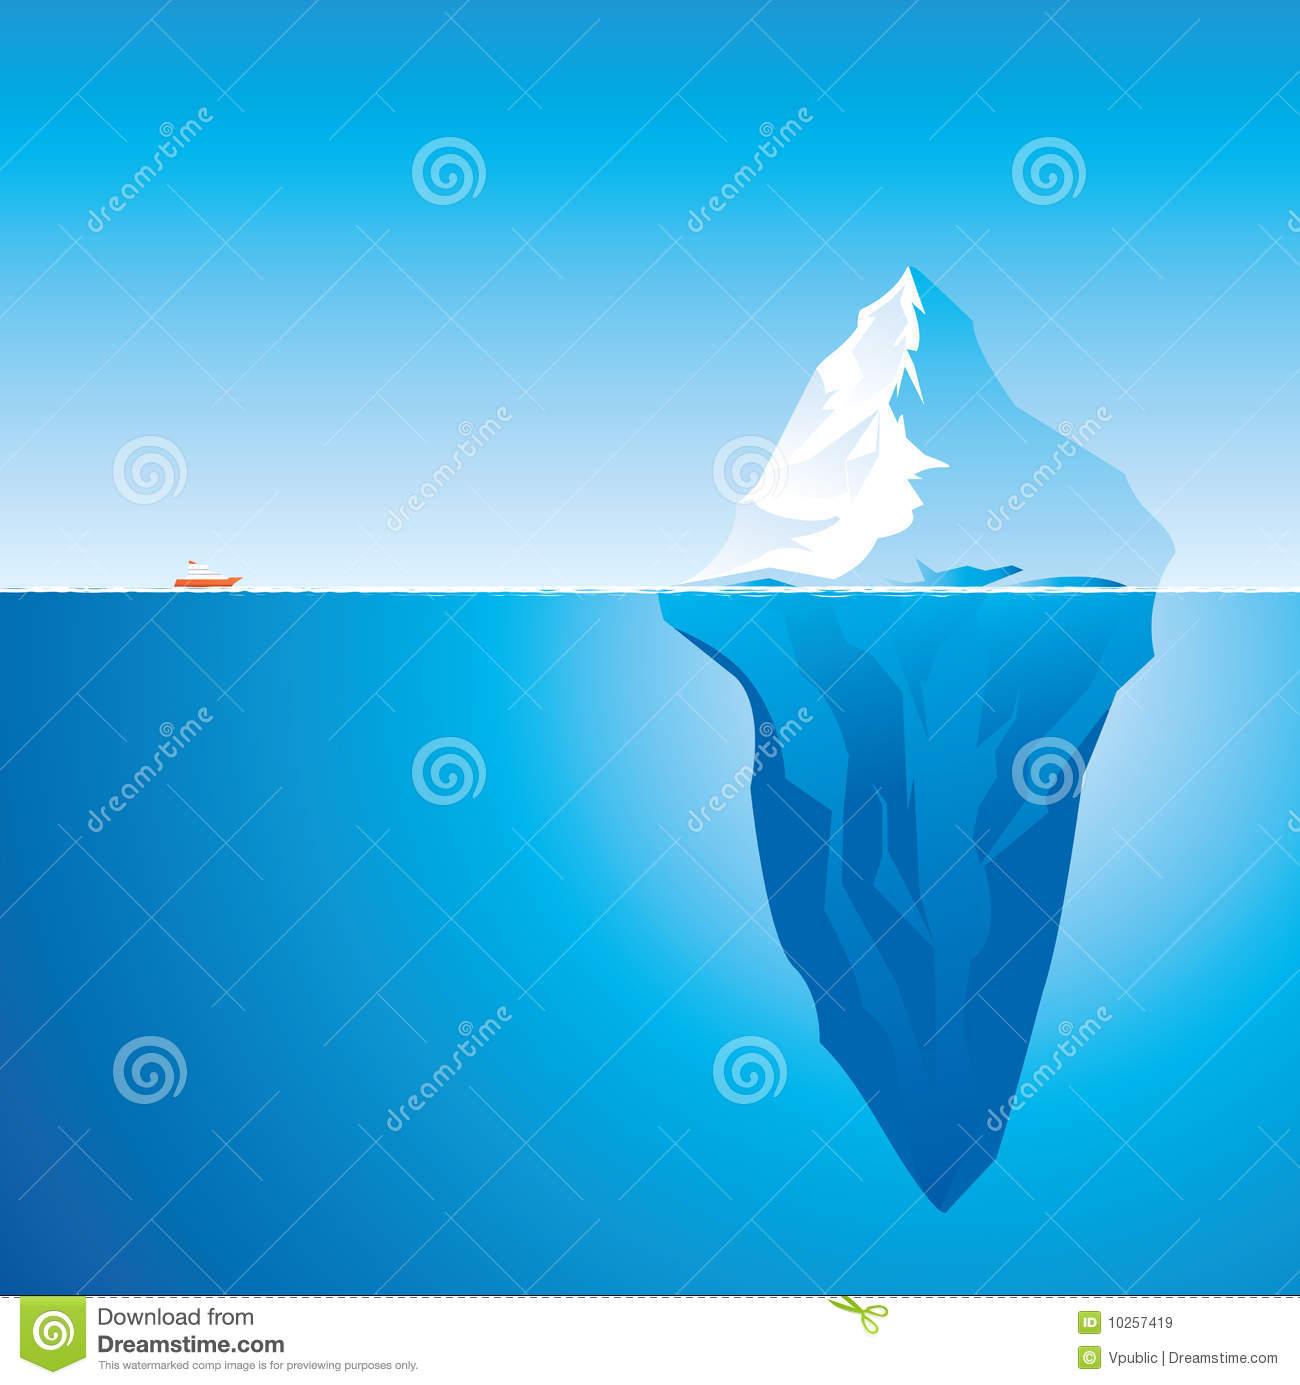 Iceberg Stock Illustrations.